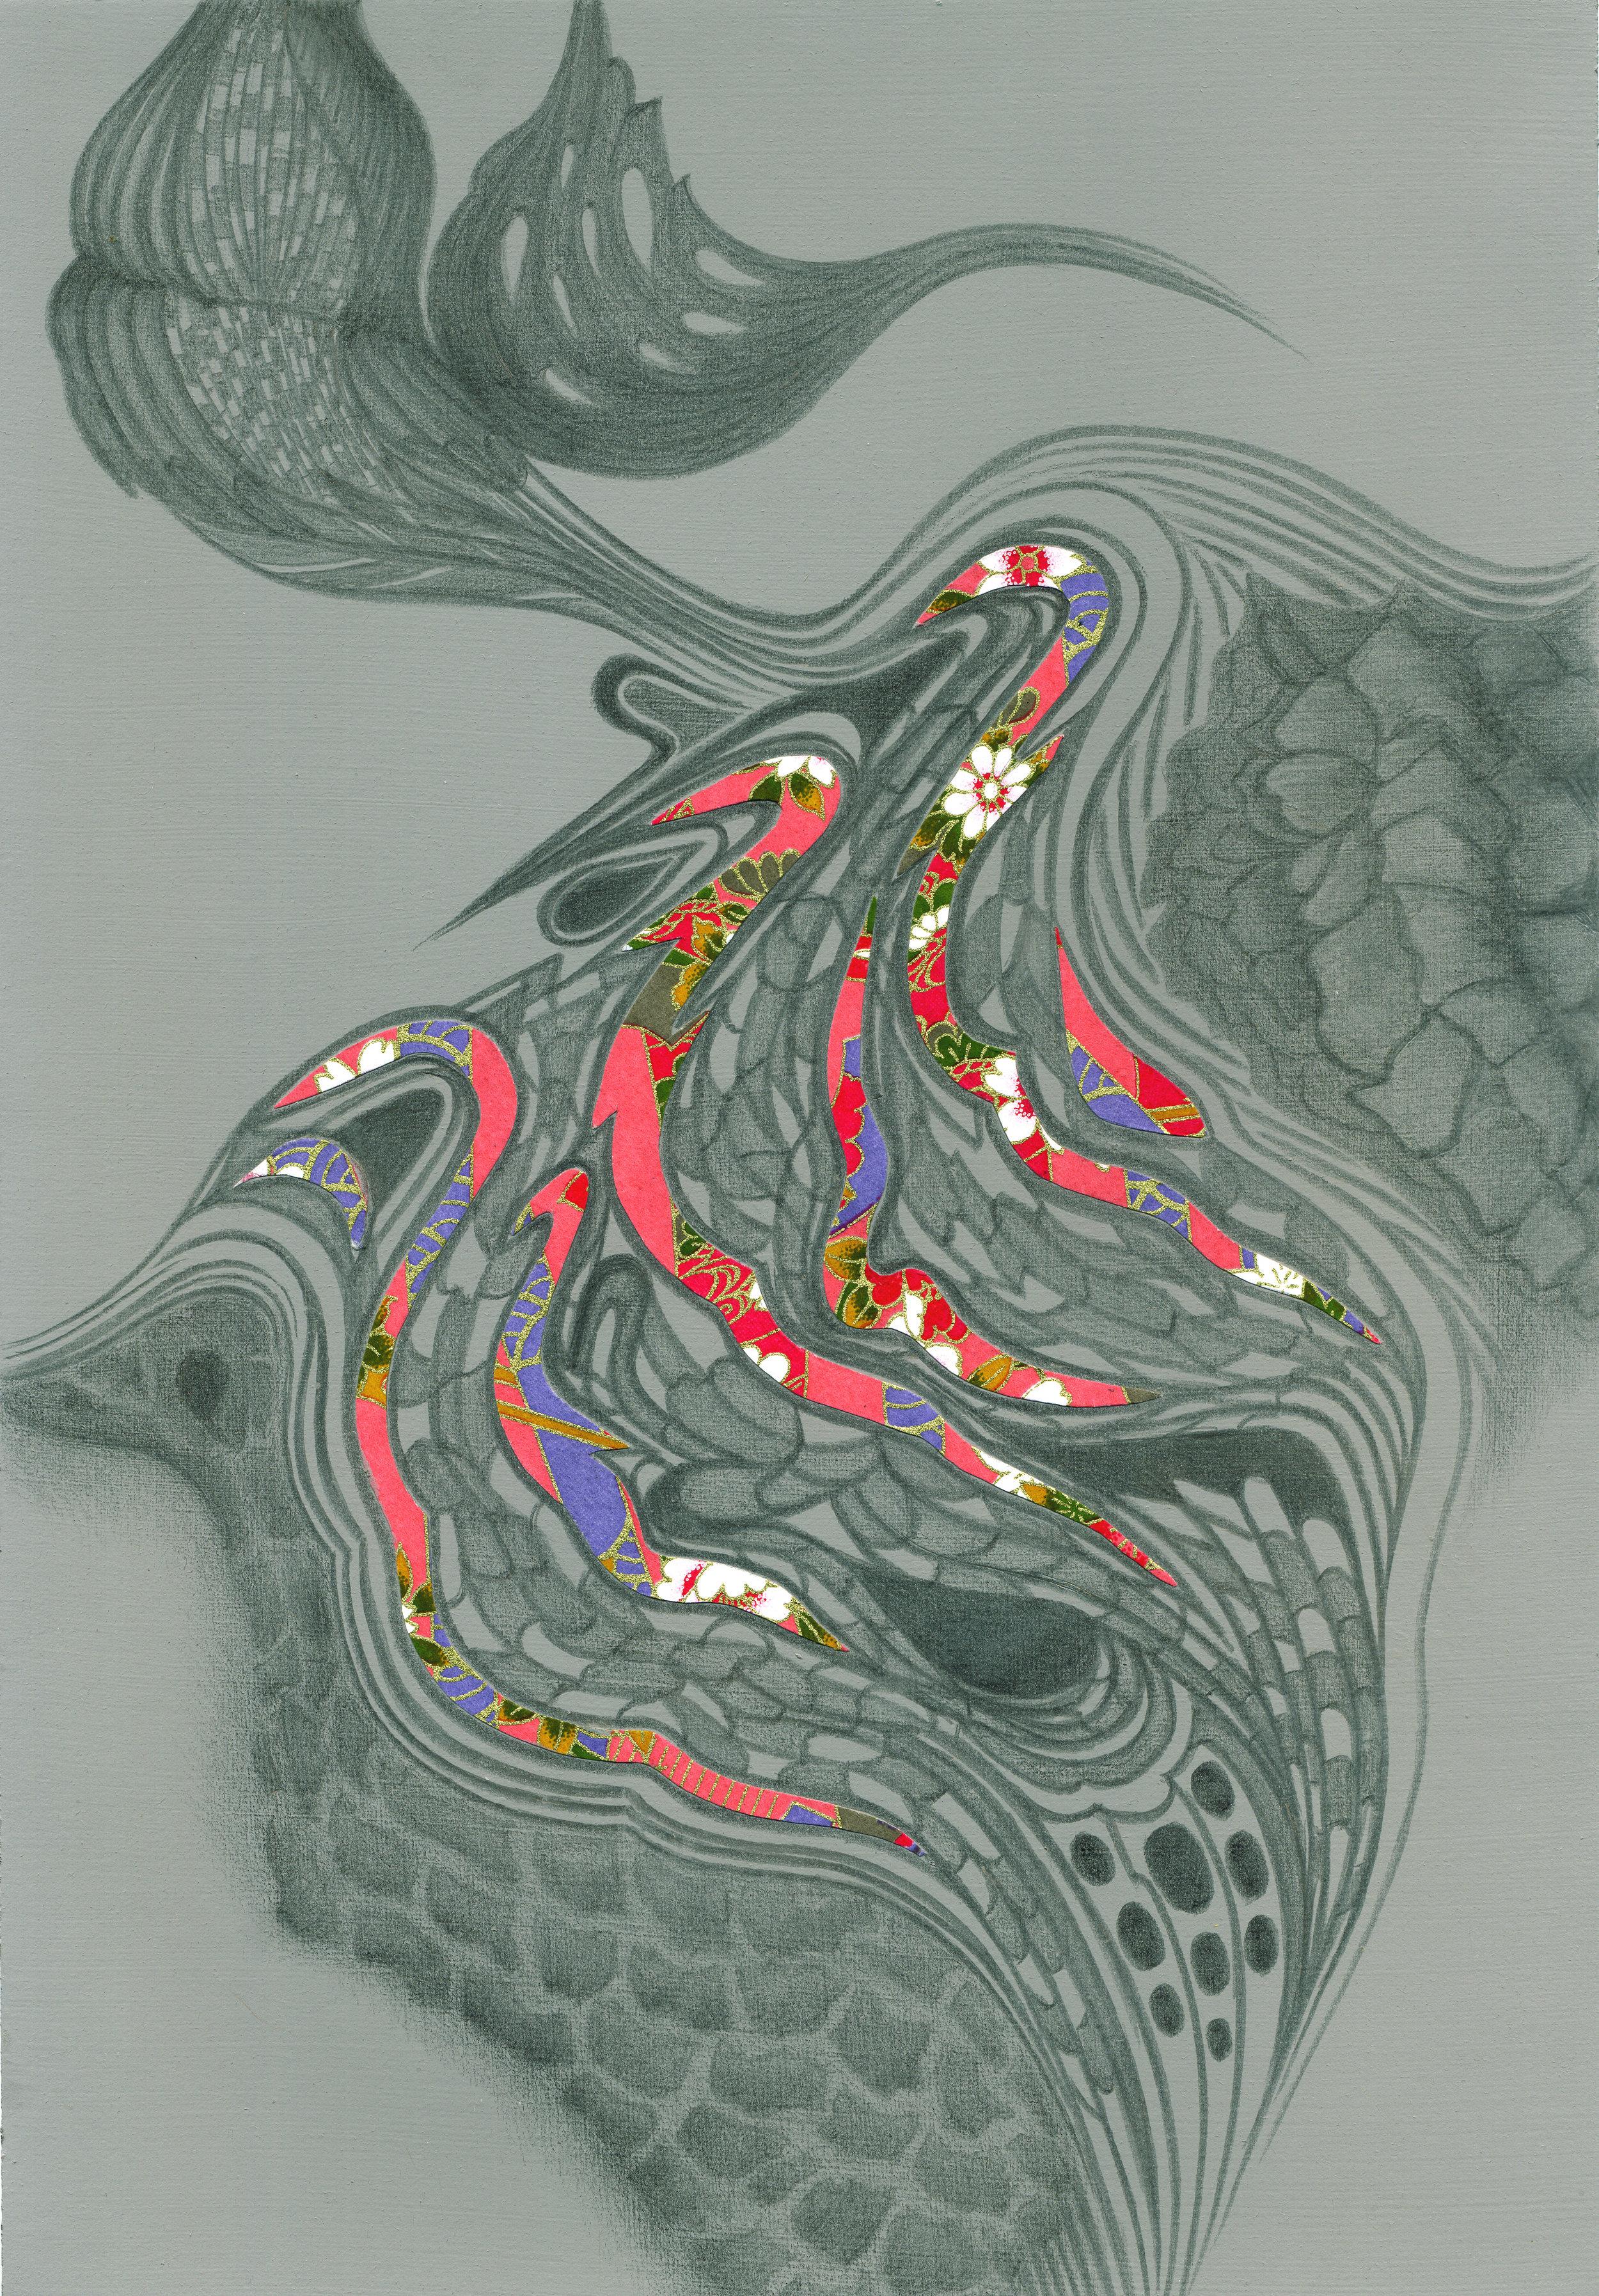 Cork Contours, silverpoint - Washi paper, Jeannine Cook artist